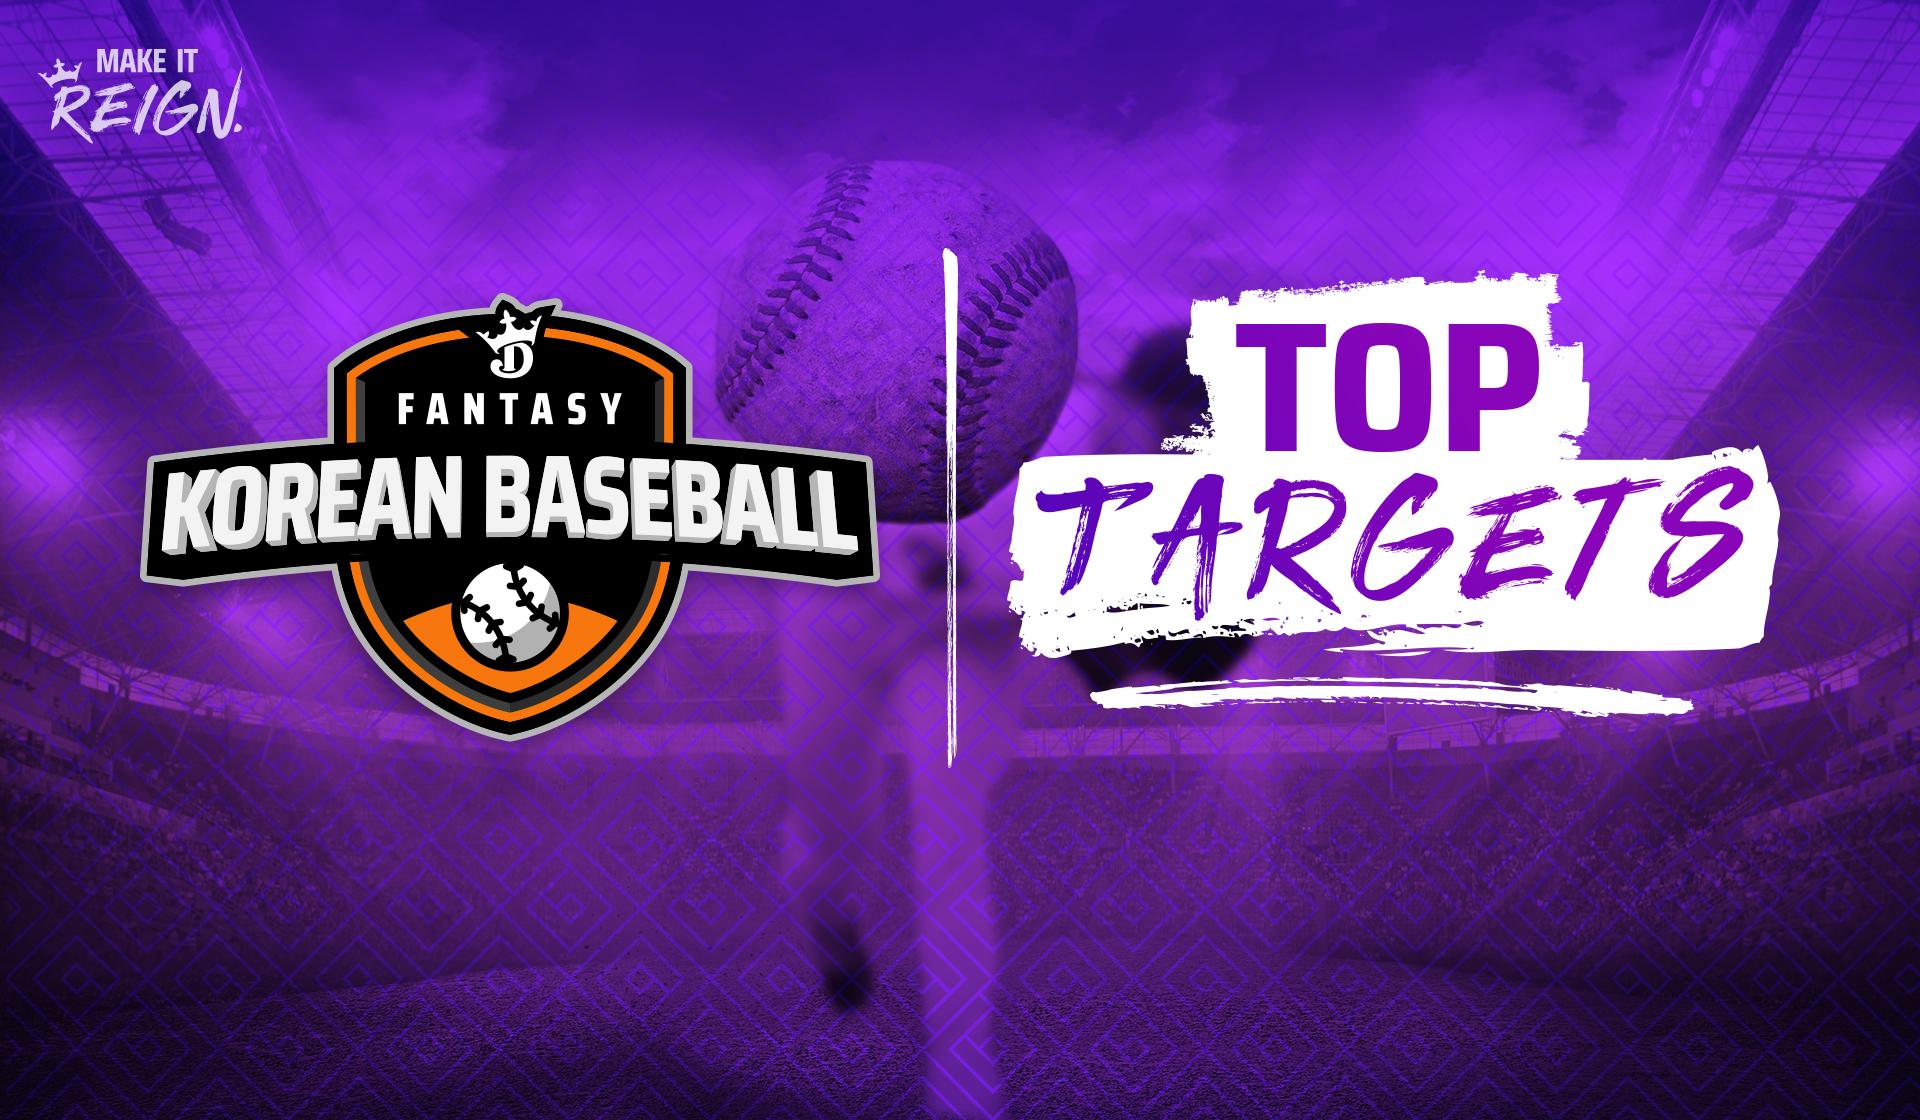 Korean Baseball Fantasy Picks: Top DraftKings KBO DFS Targets and Values for June 2